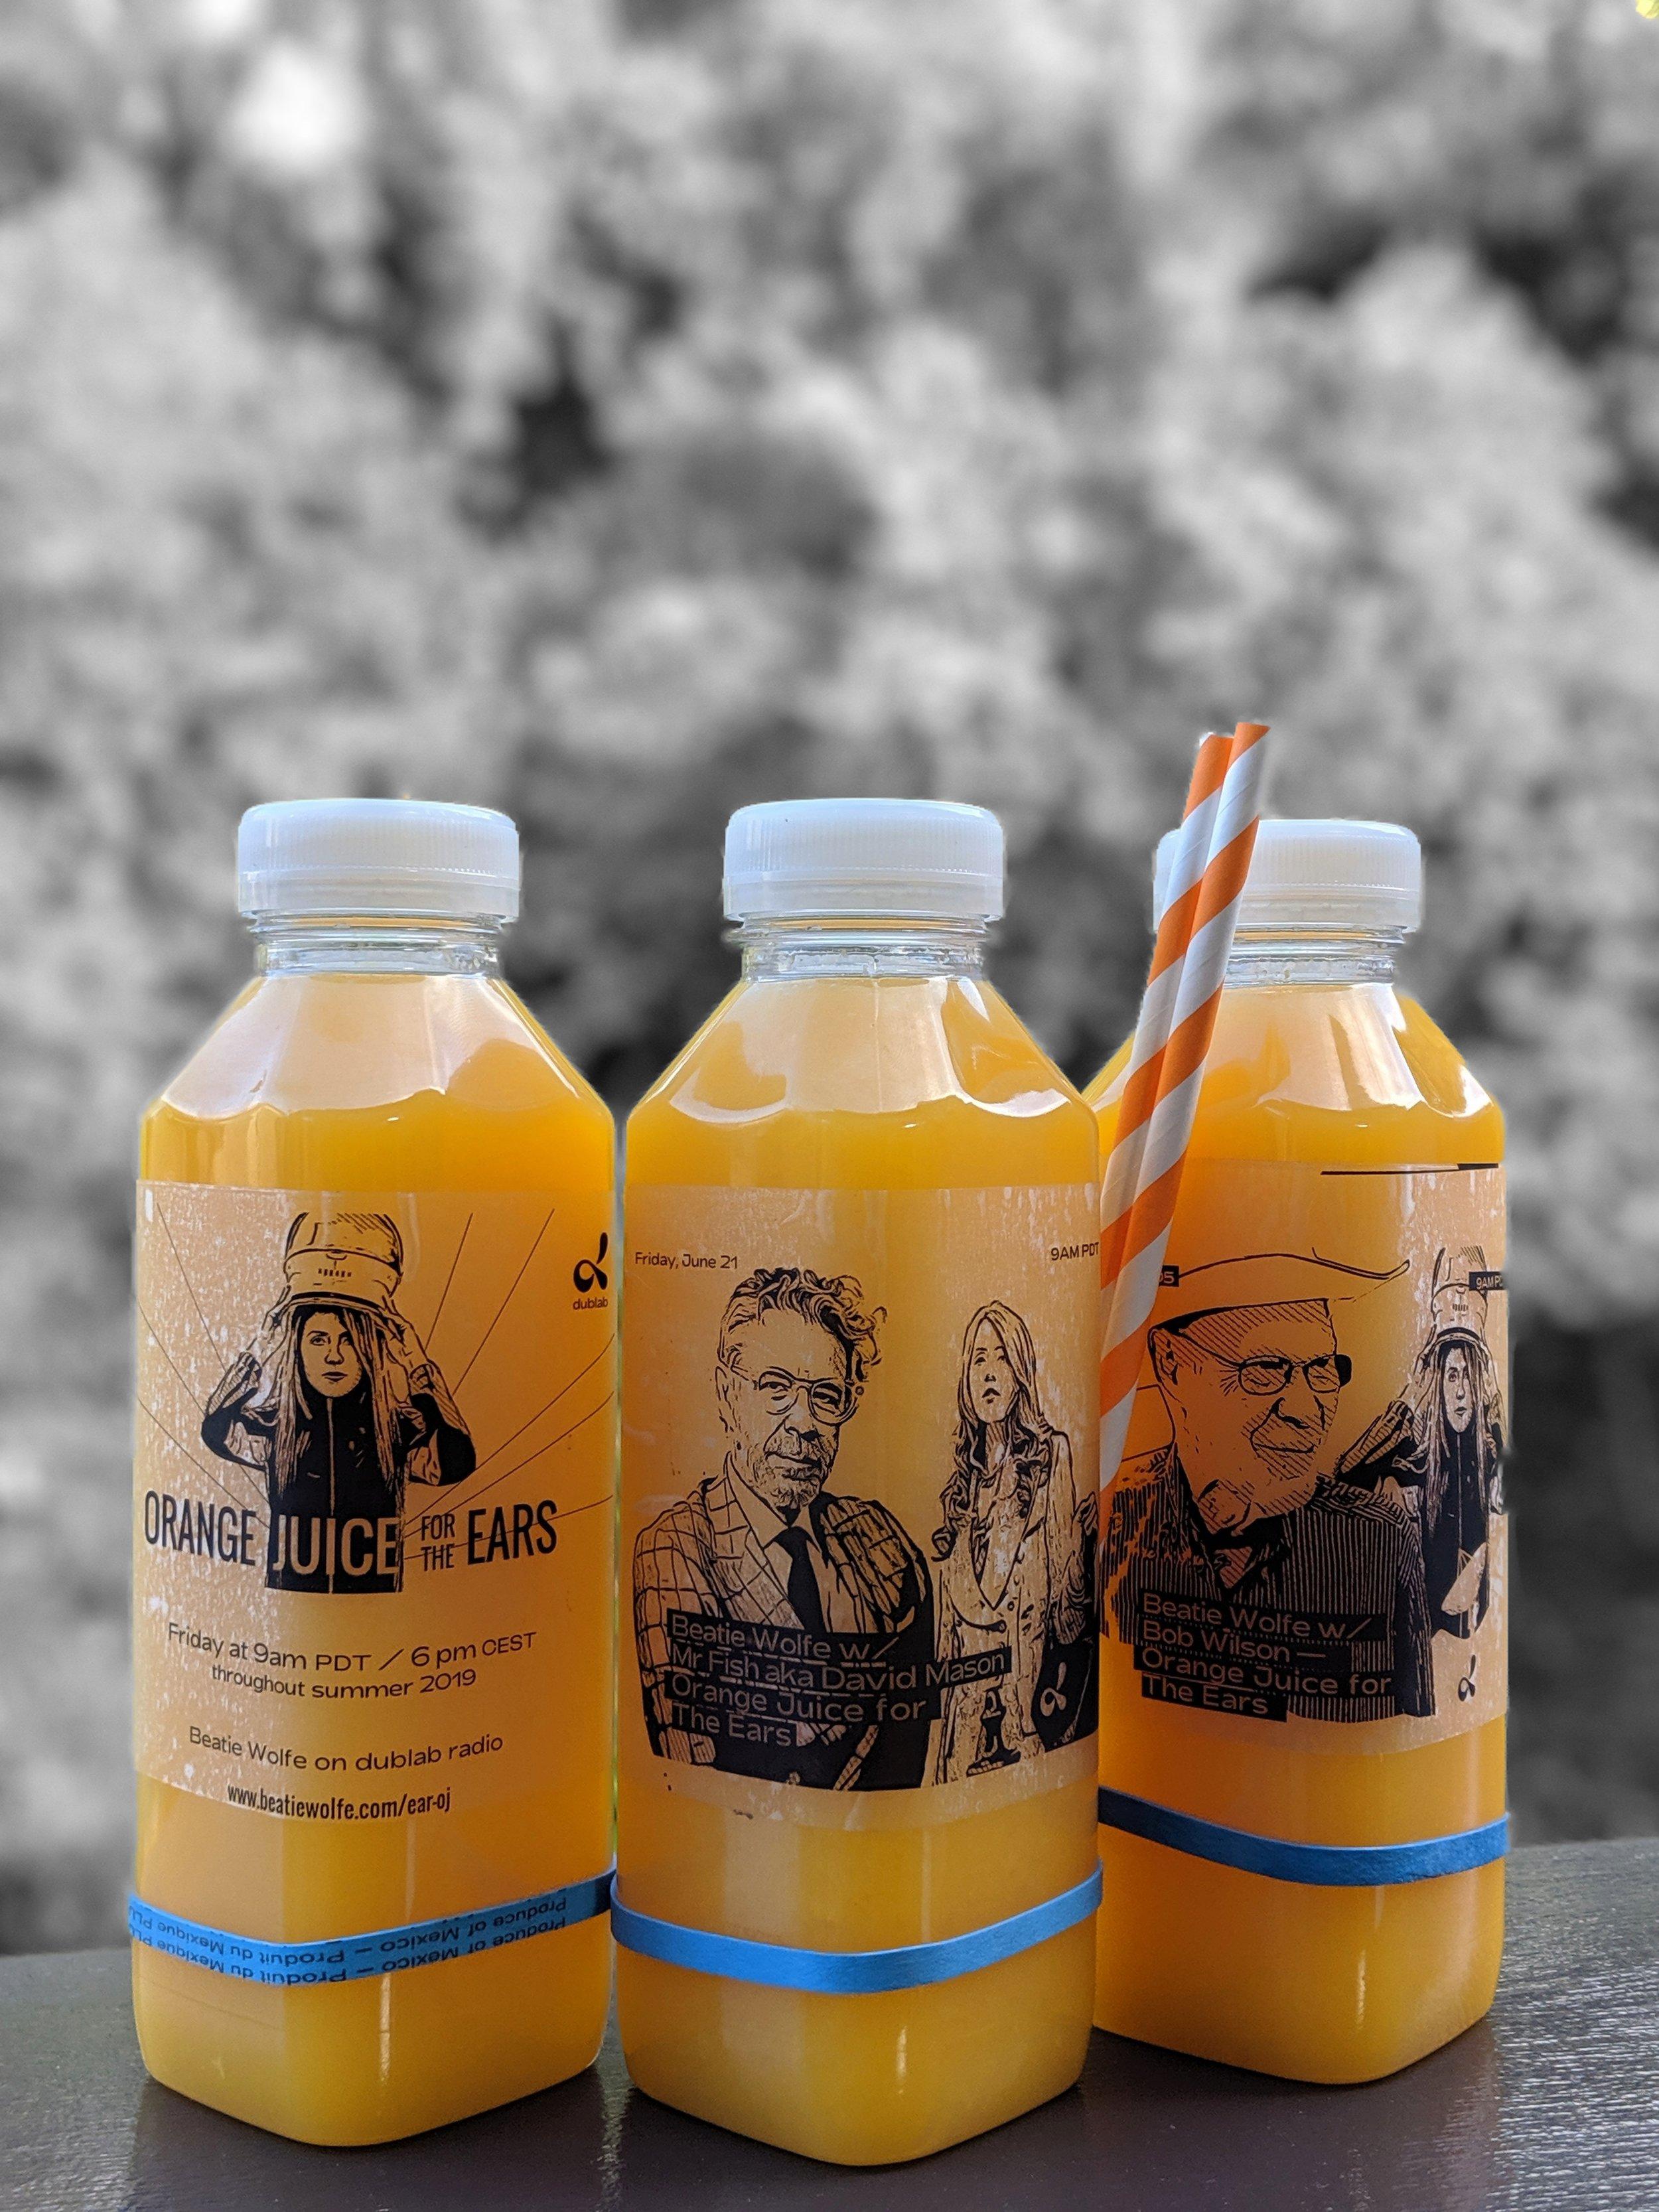 David Mason;s Orange Juice for the Ears